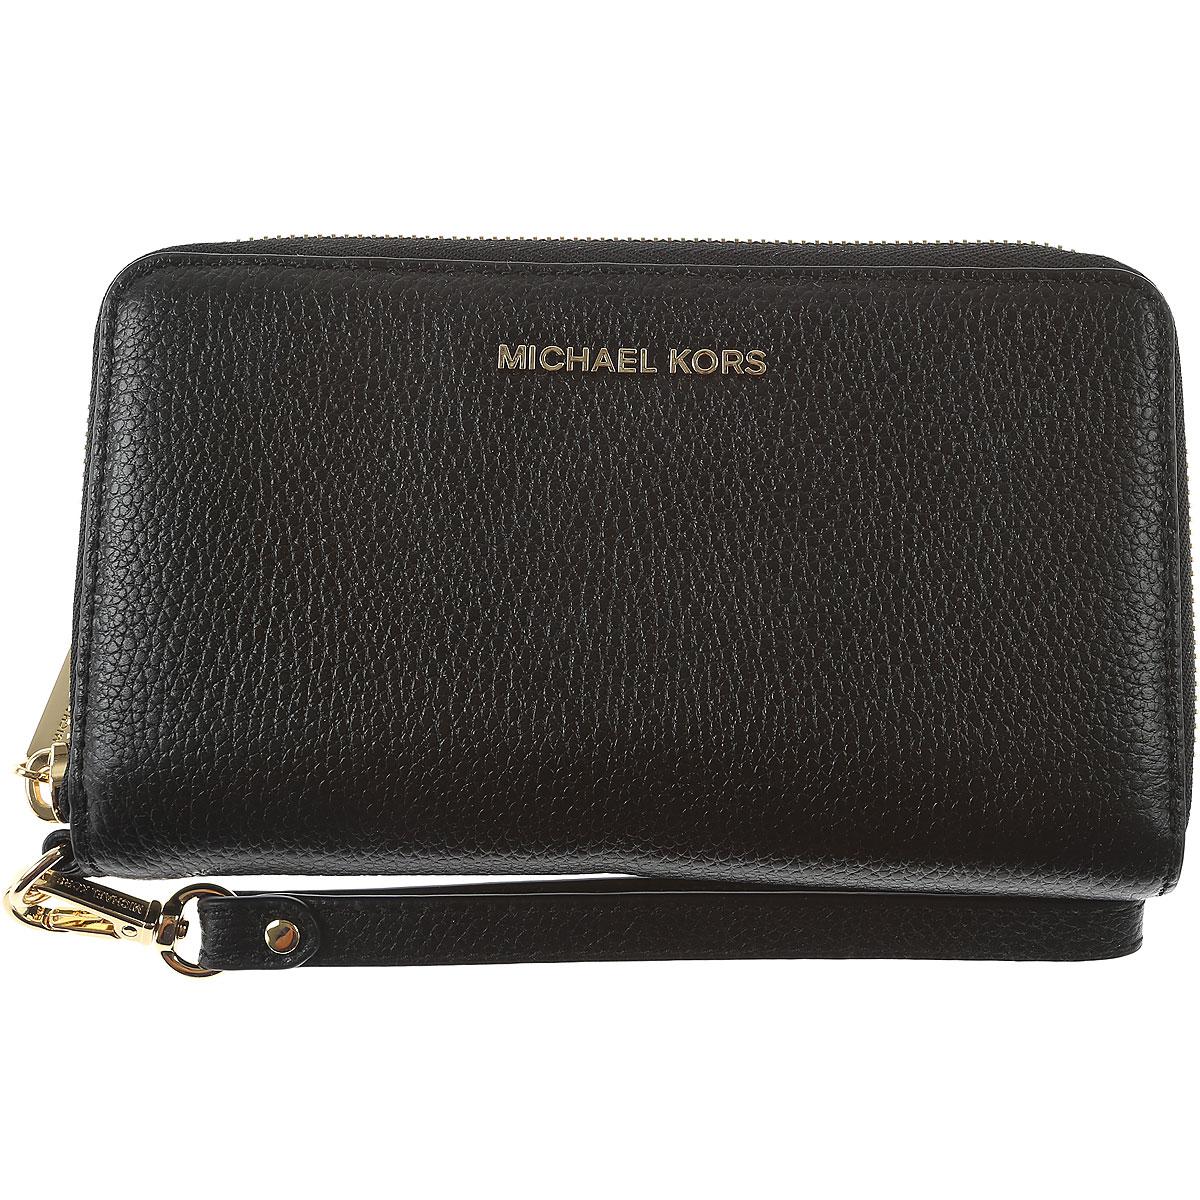 826928b5922b Michael Kors Wallet for Women On Sale, Black, Leather, 2019